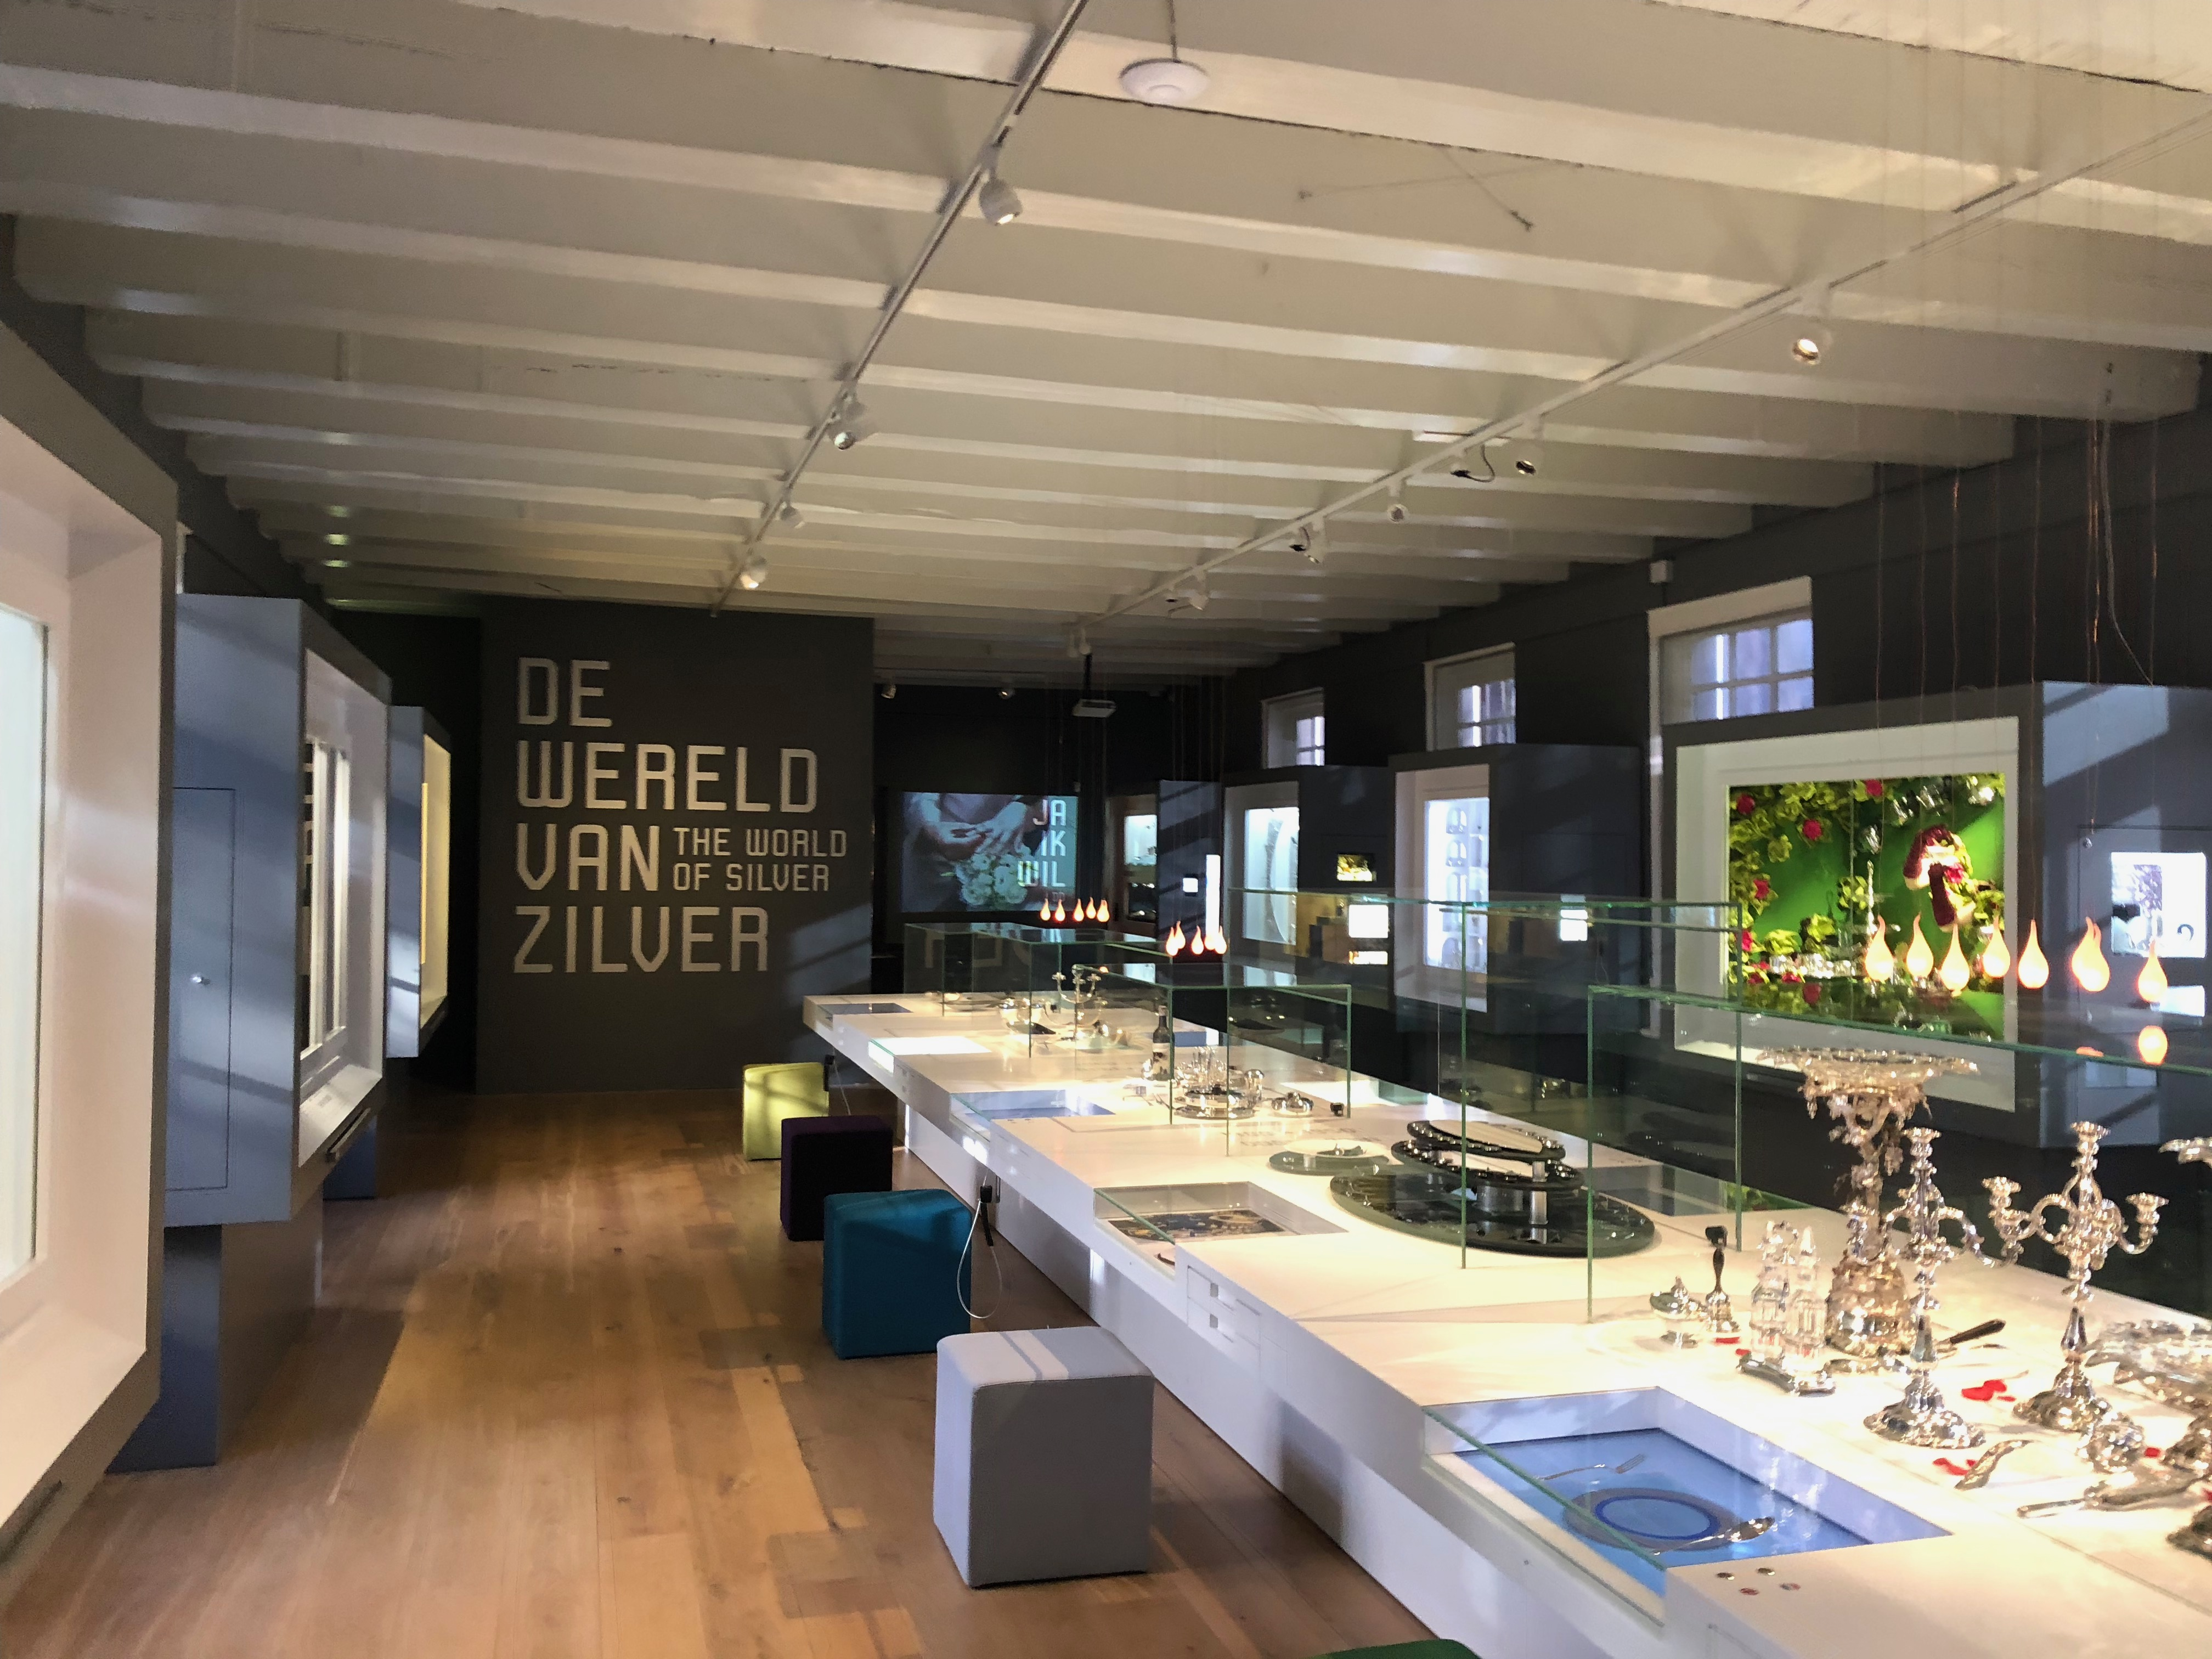 Zilvermuseum Schoonhoven, vaste opstelling, 2019. Foto Hanno Lans, interieur, vitrines